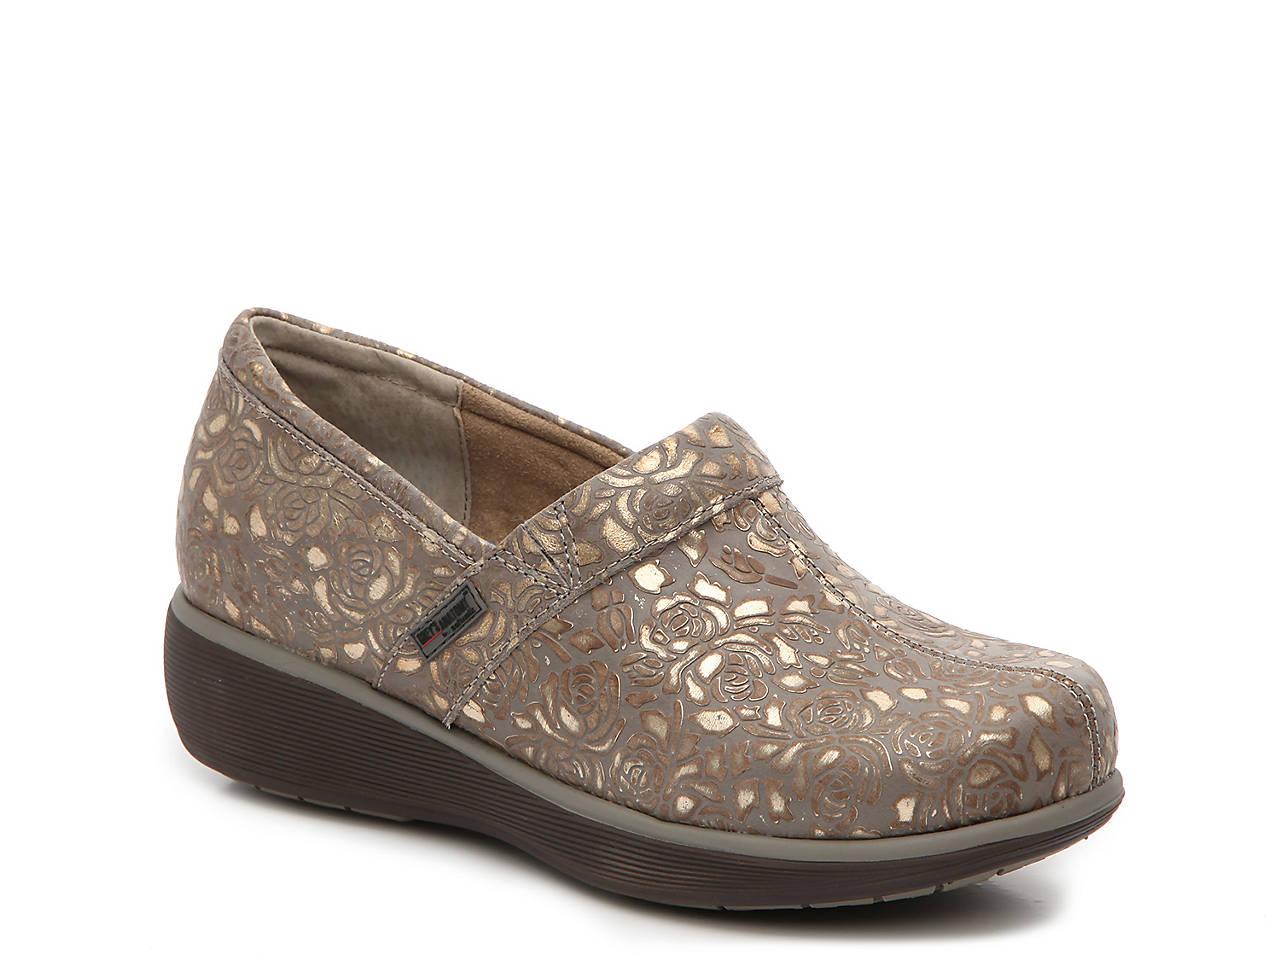 Grey\'s Anatomy by Softwalk Meredith Work Clog Women\'s Shoes | DSW